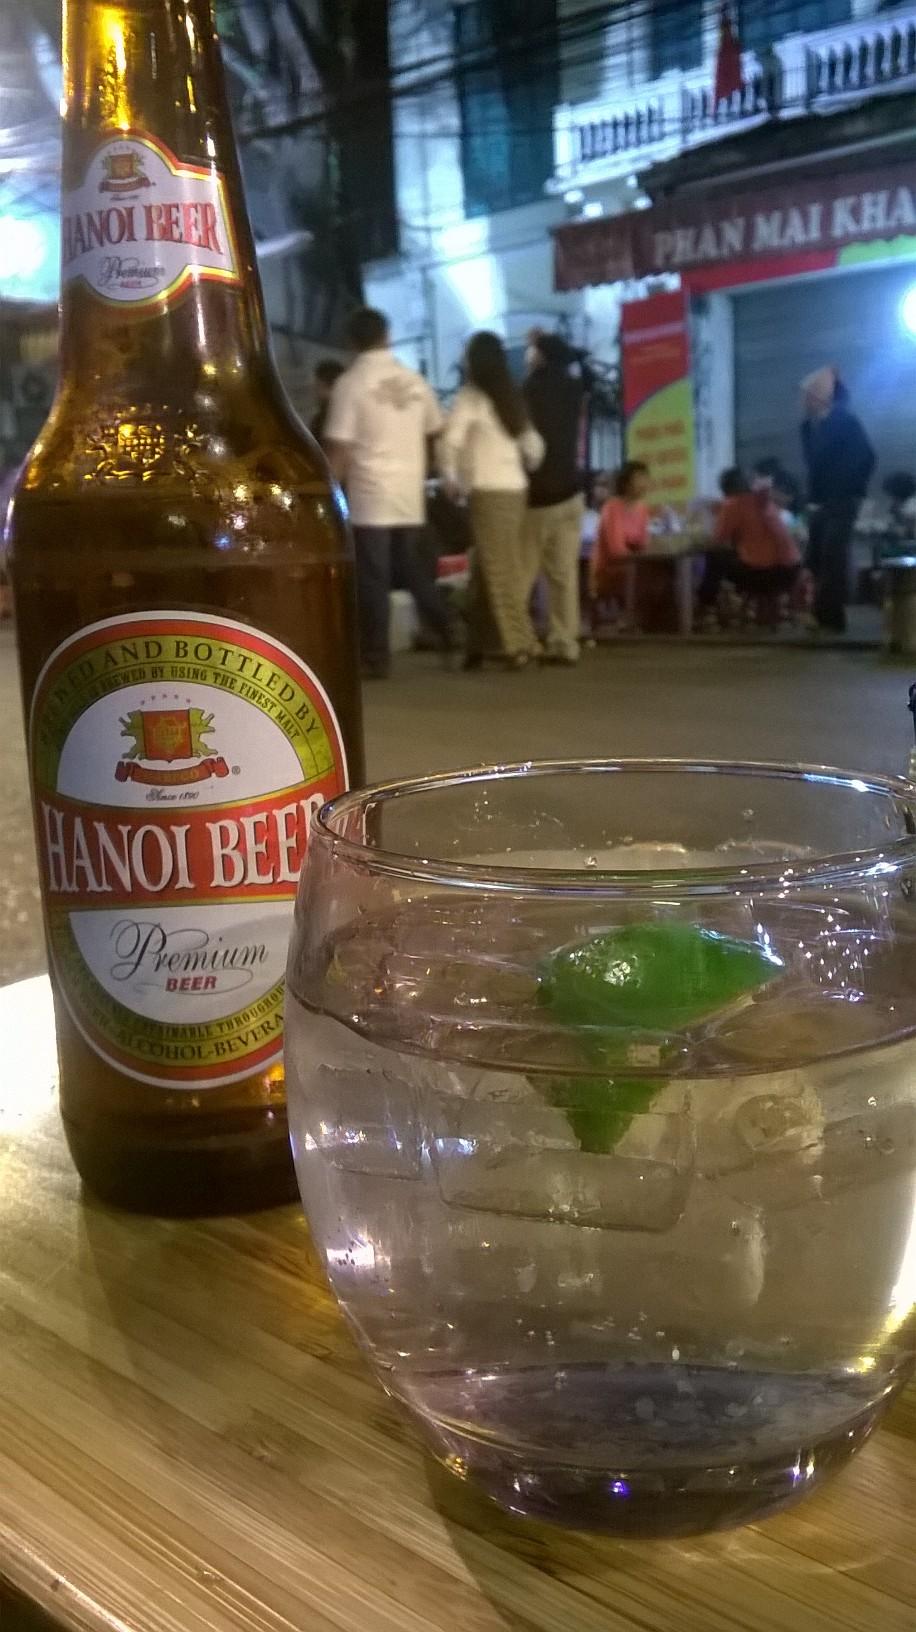 Hanoi - beer